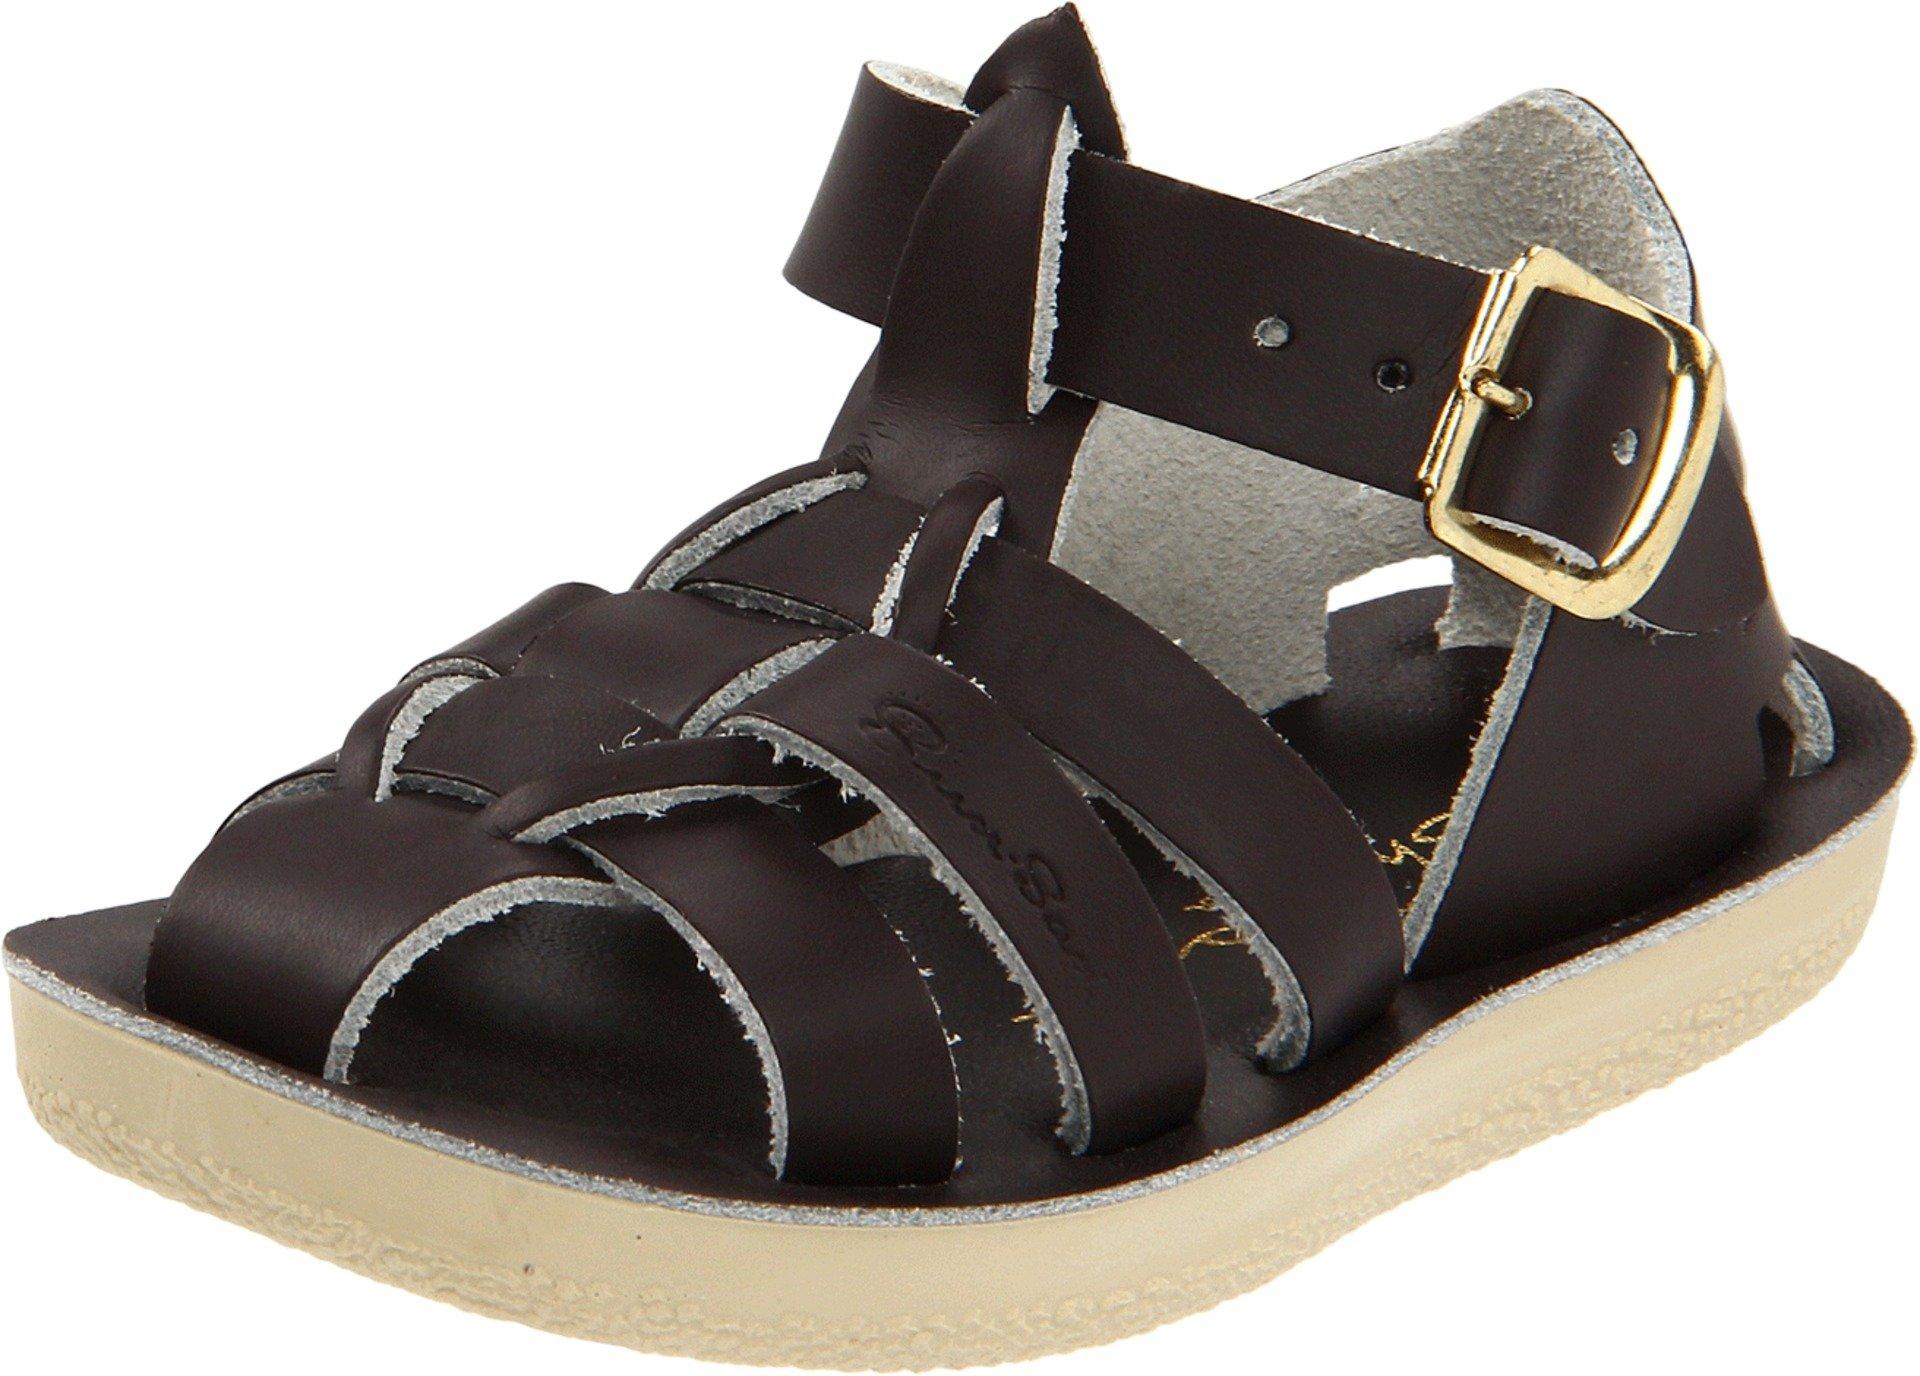 Salt Water Sandals by Hoy Shoe Sharks,Brown,7 M US Toddler by Salt Water Sandals